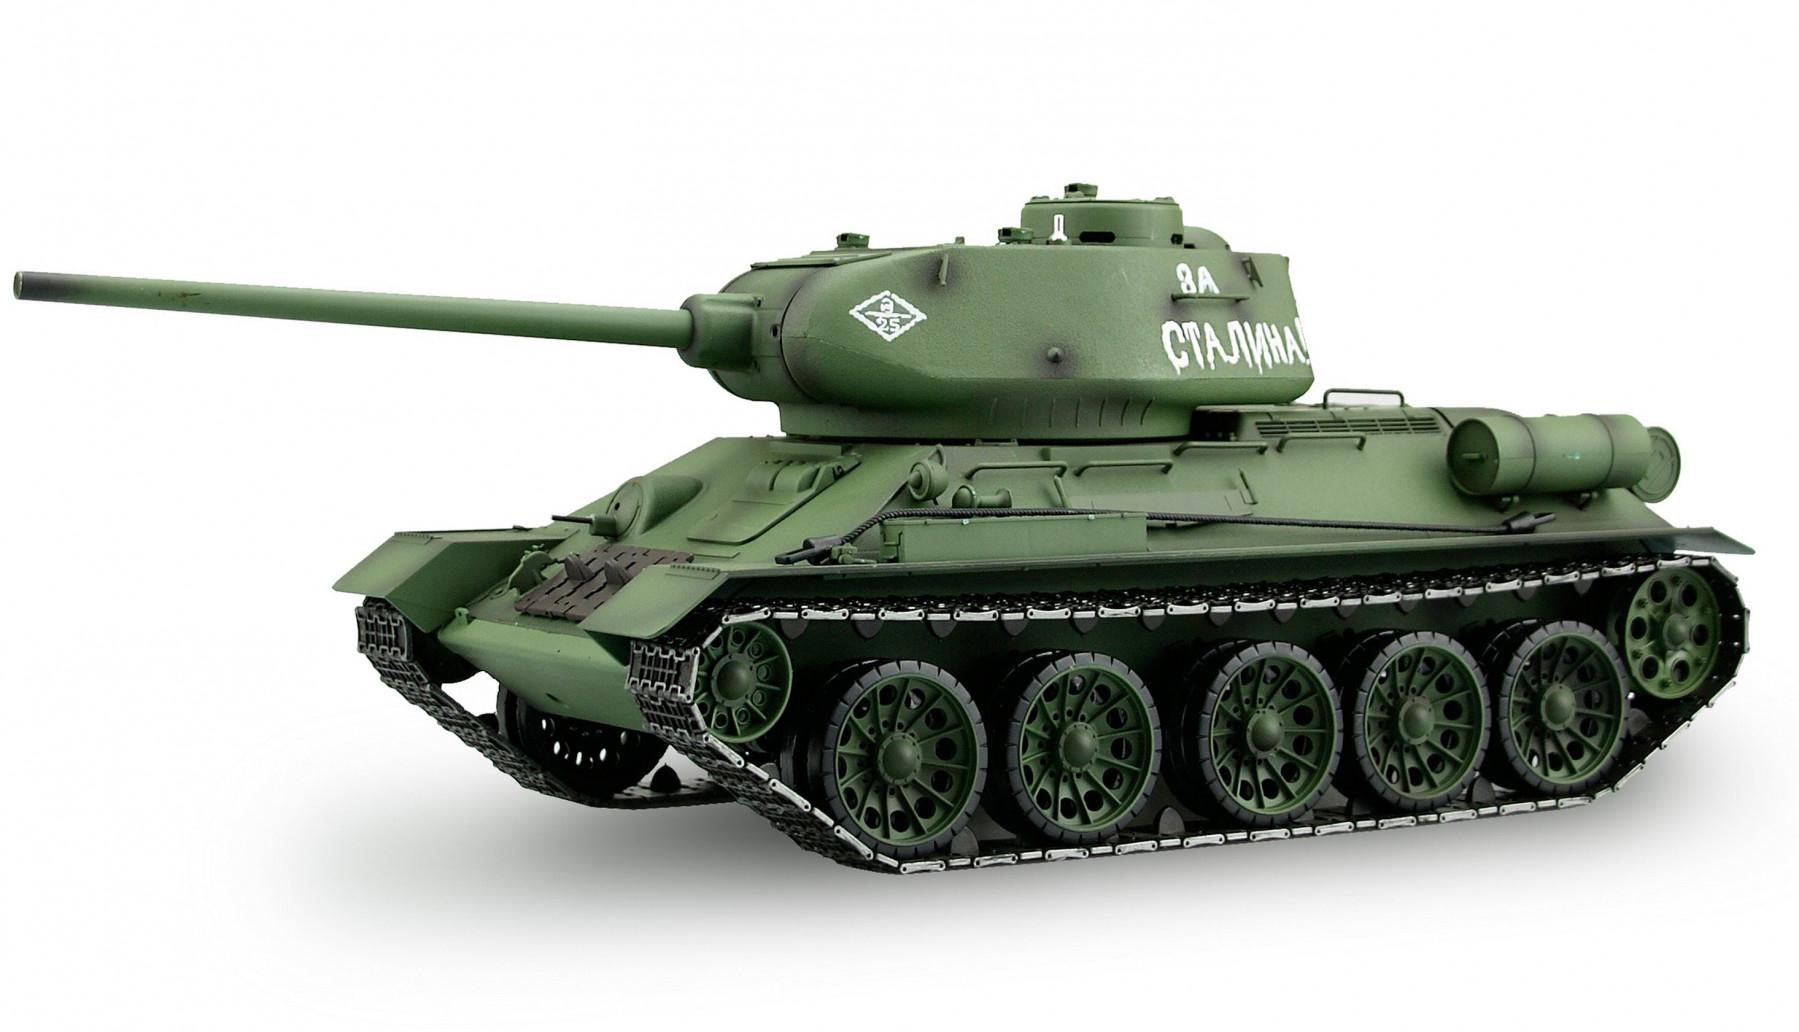 Amewi T-34/85 - Funkgesteuerter (RC) Panzer - Elektromotor - 1:16 - Montagesatz - Grün - 2,4 GHz